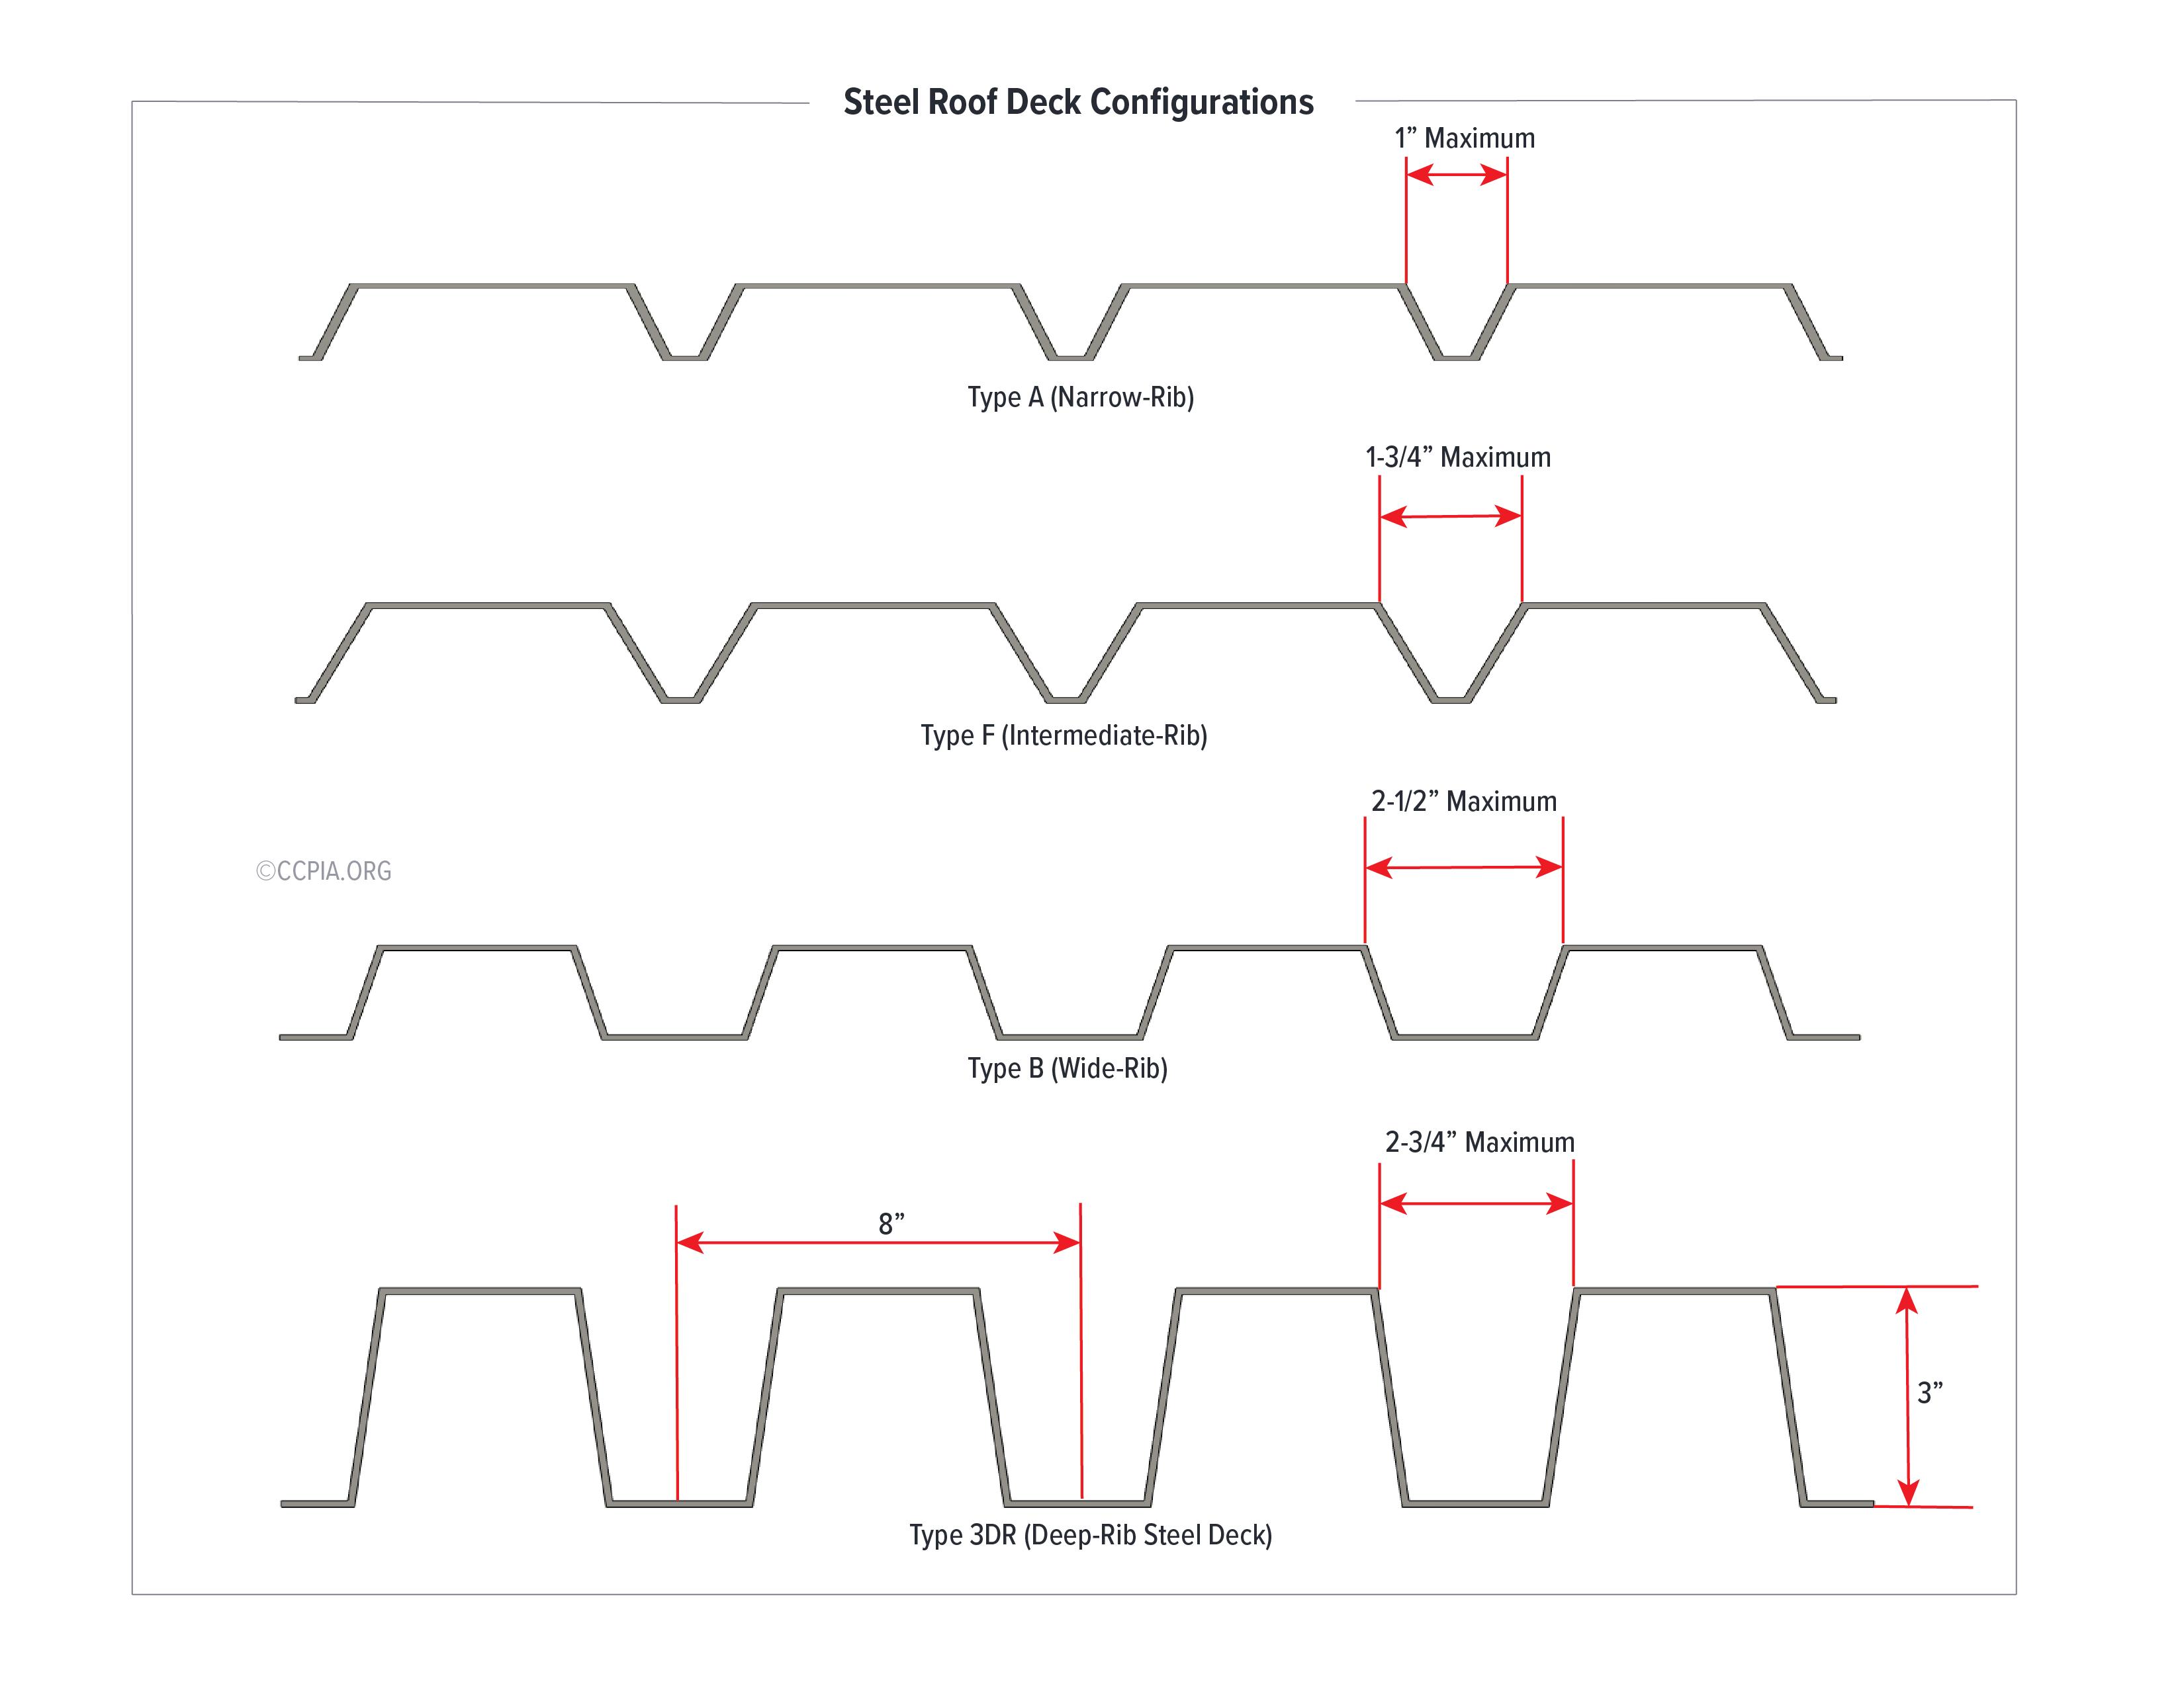 Steel Roof Deck Configuration (Low-Slope Roof): Type A (Narrow-Rib), Type F (Intermediate-Rib), Type B (Wide-Rib), Type 3DR (Deep-Rib Steel Deck)